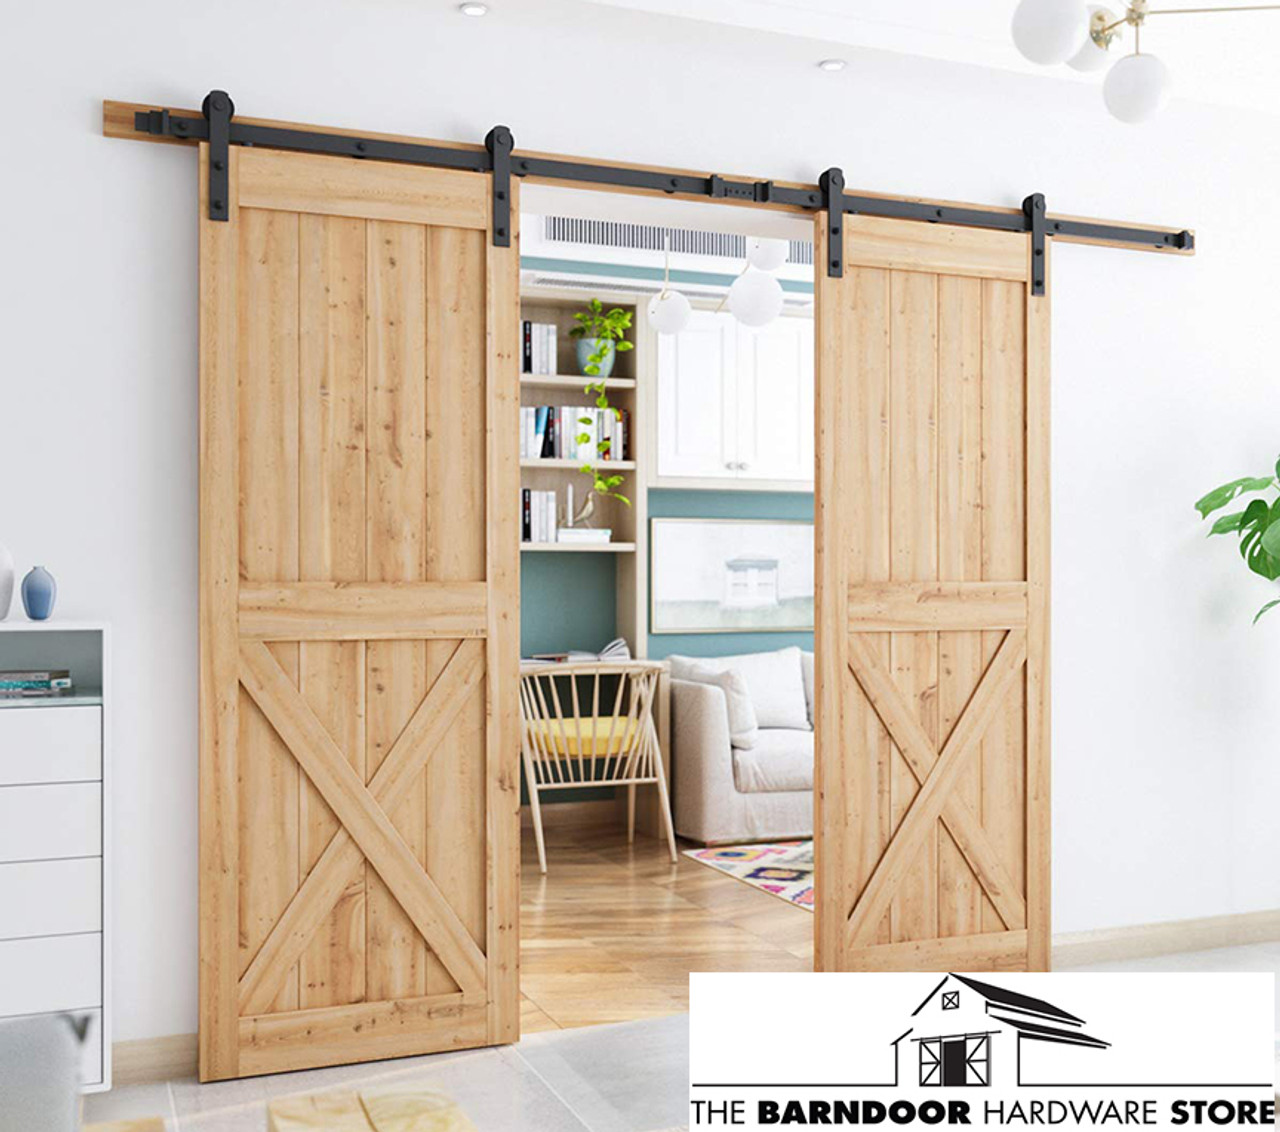 Double Sliding Barn Door Hardware Kit - The Barn Door ...